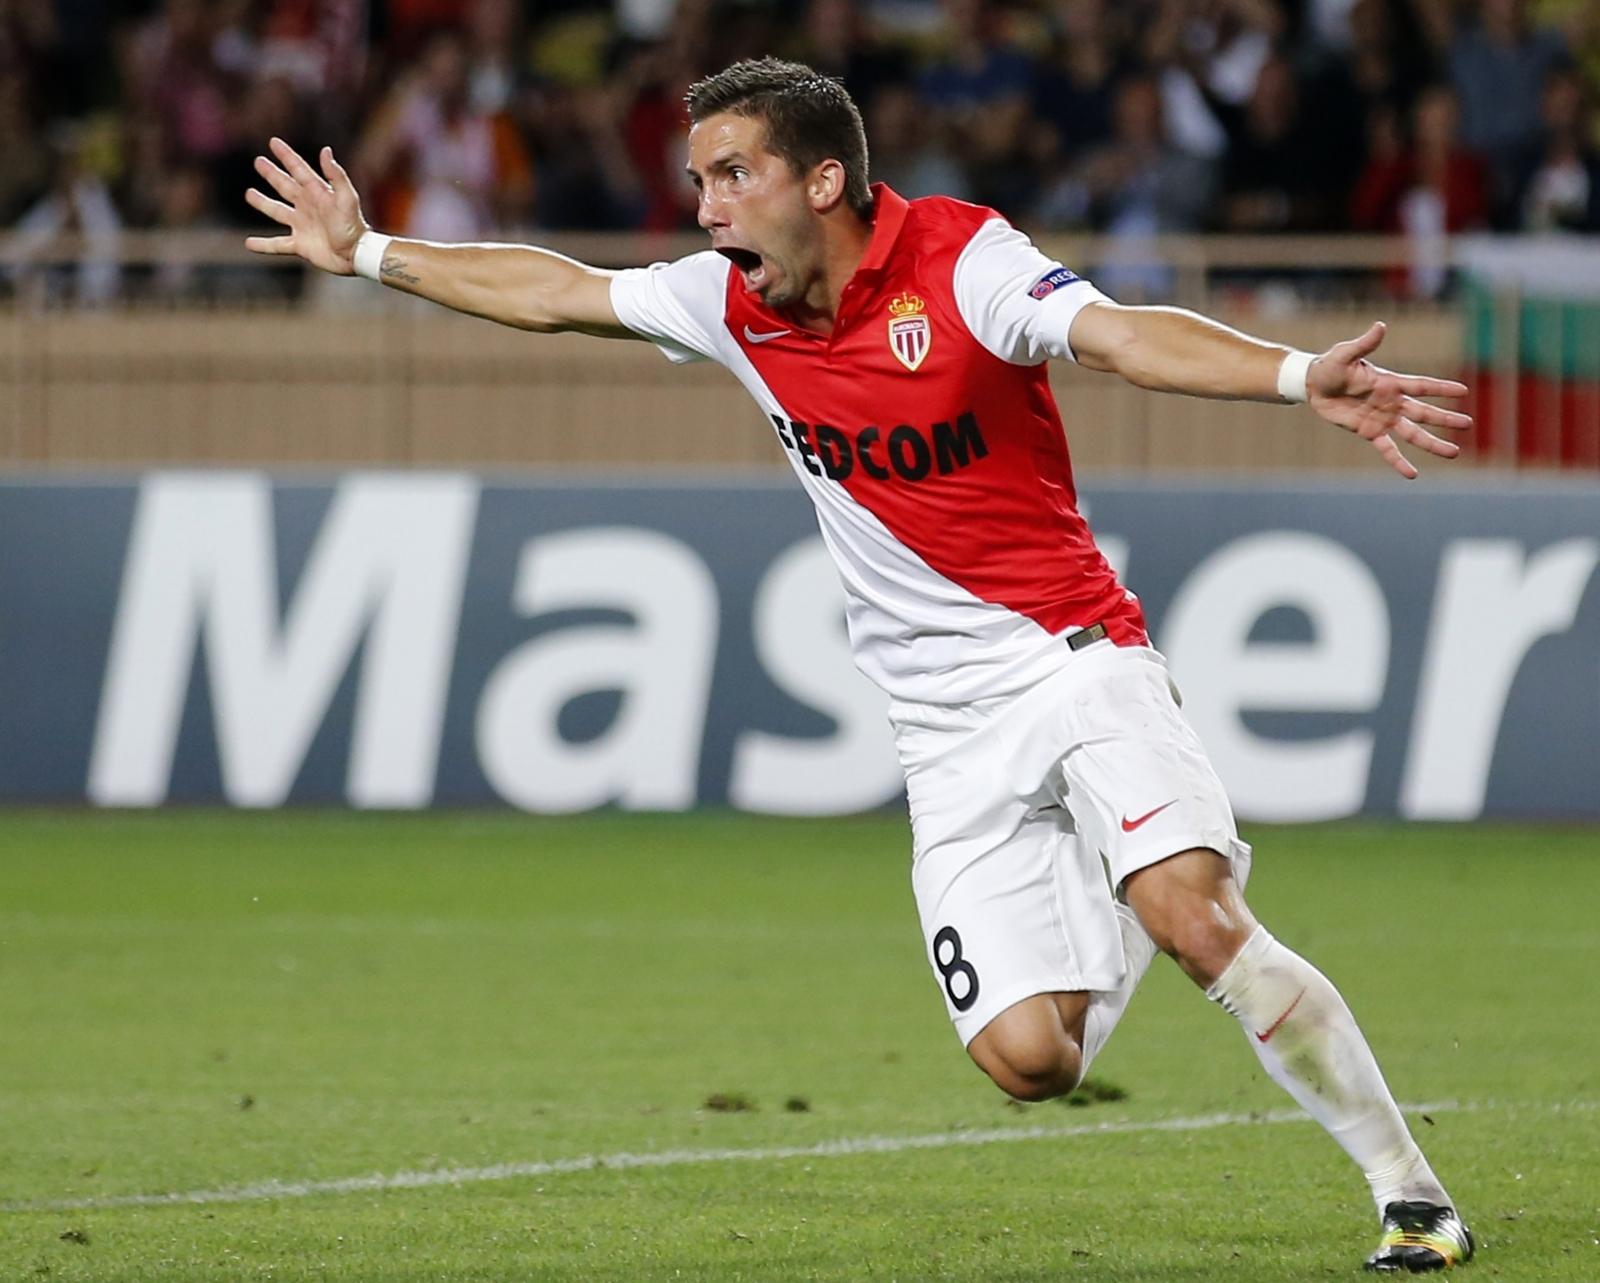 Arsenal v Monaco Joao Moutinho fit for Champions League clash but